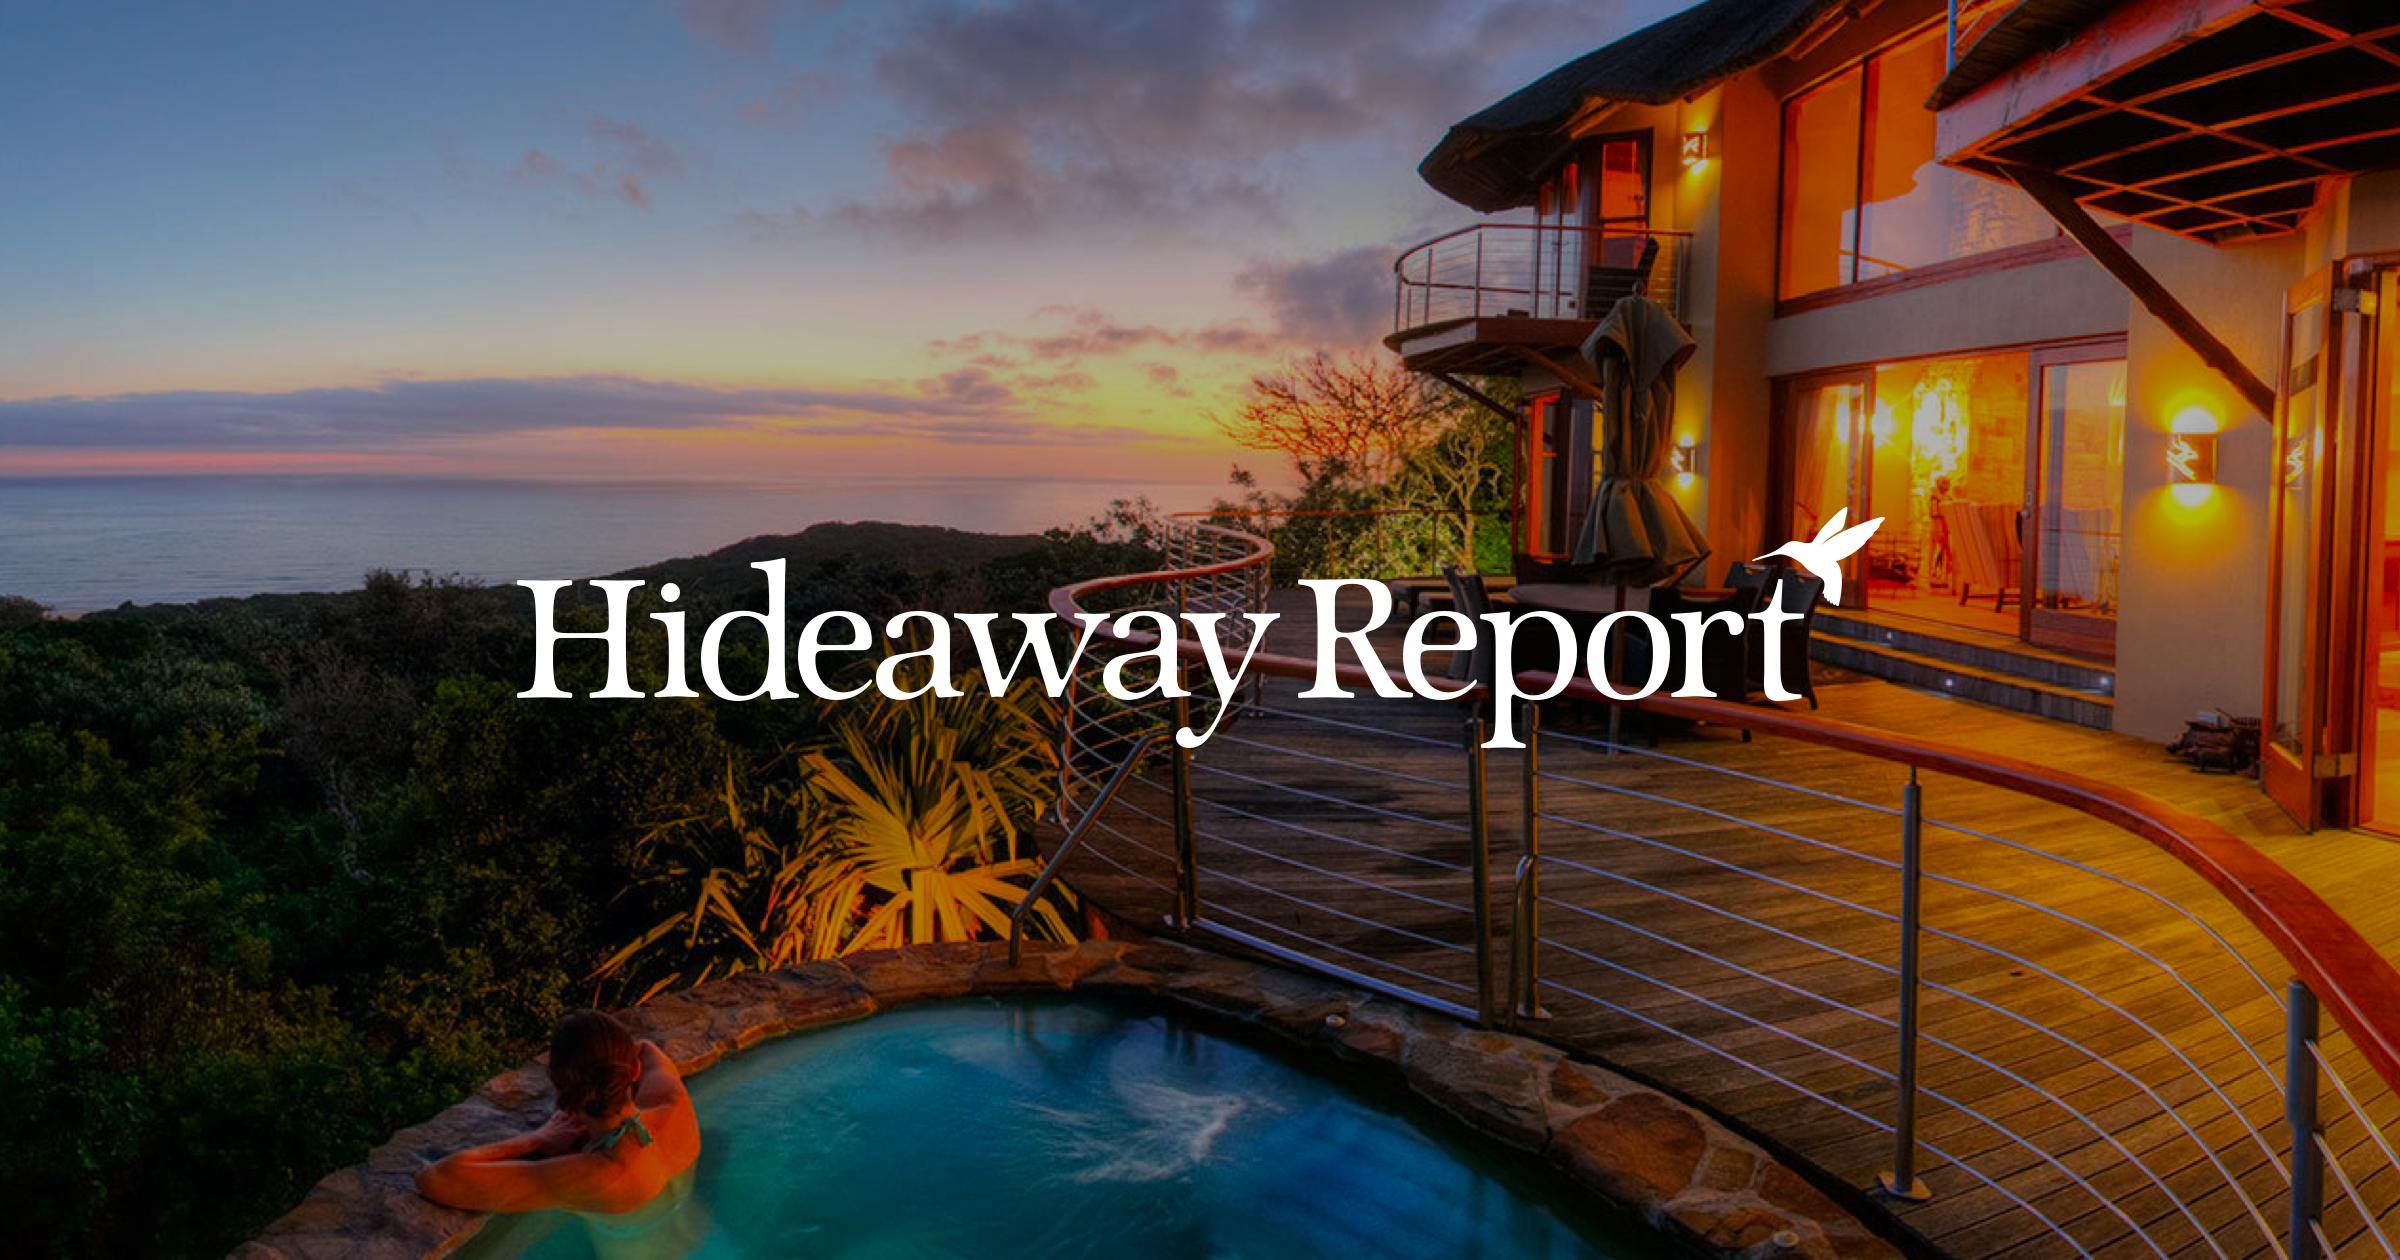 Hideaway-report-launches-new-website